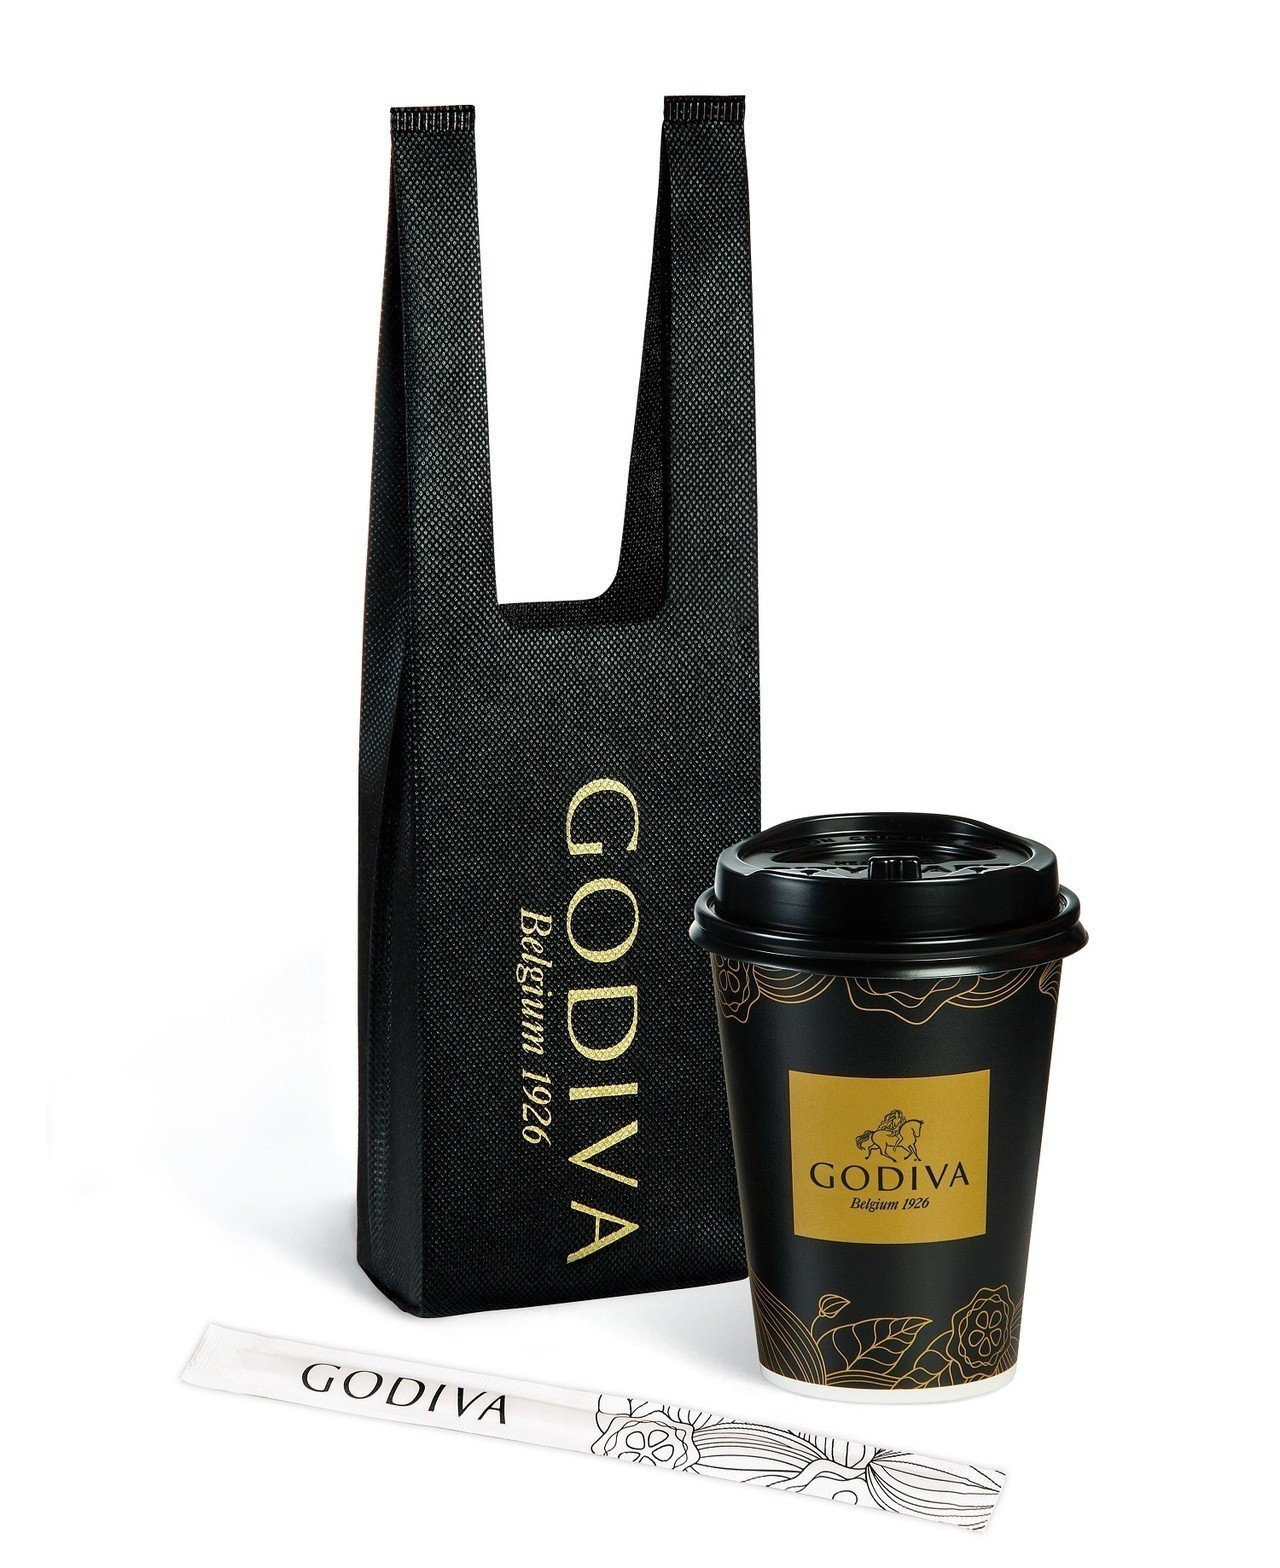 GODIVA醇黑熱巧克力,建議售價99元,全台限量65萬杯。圖/7-ELEVEN...